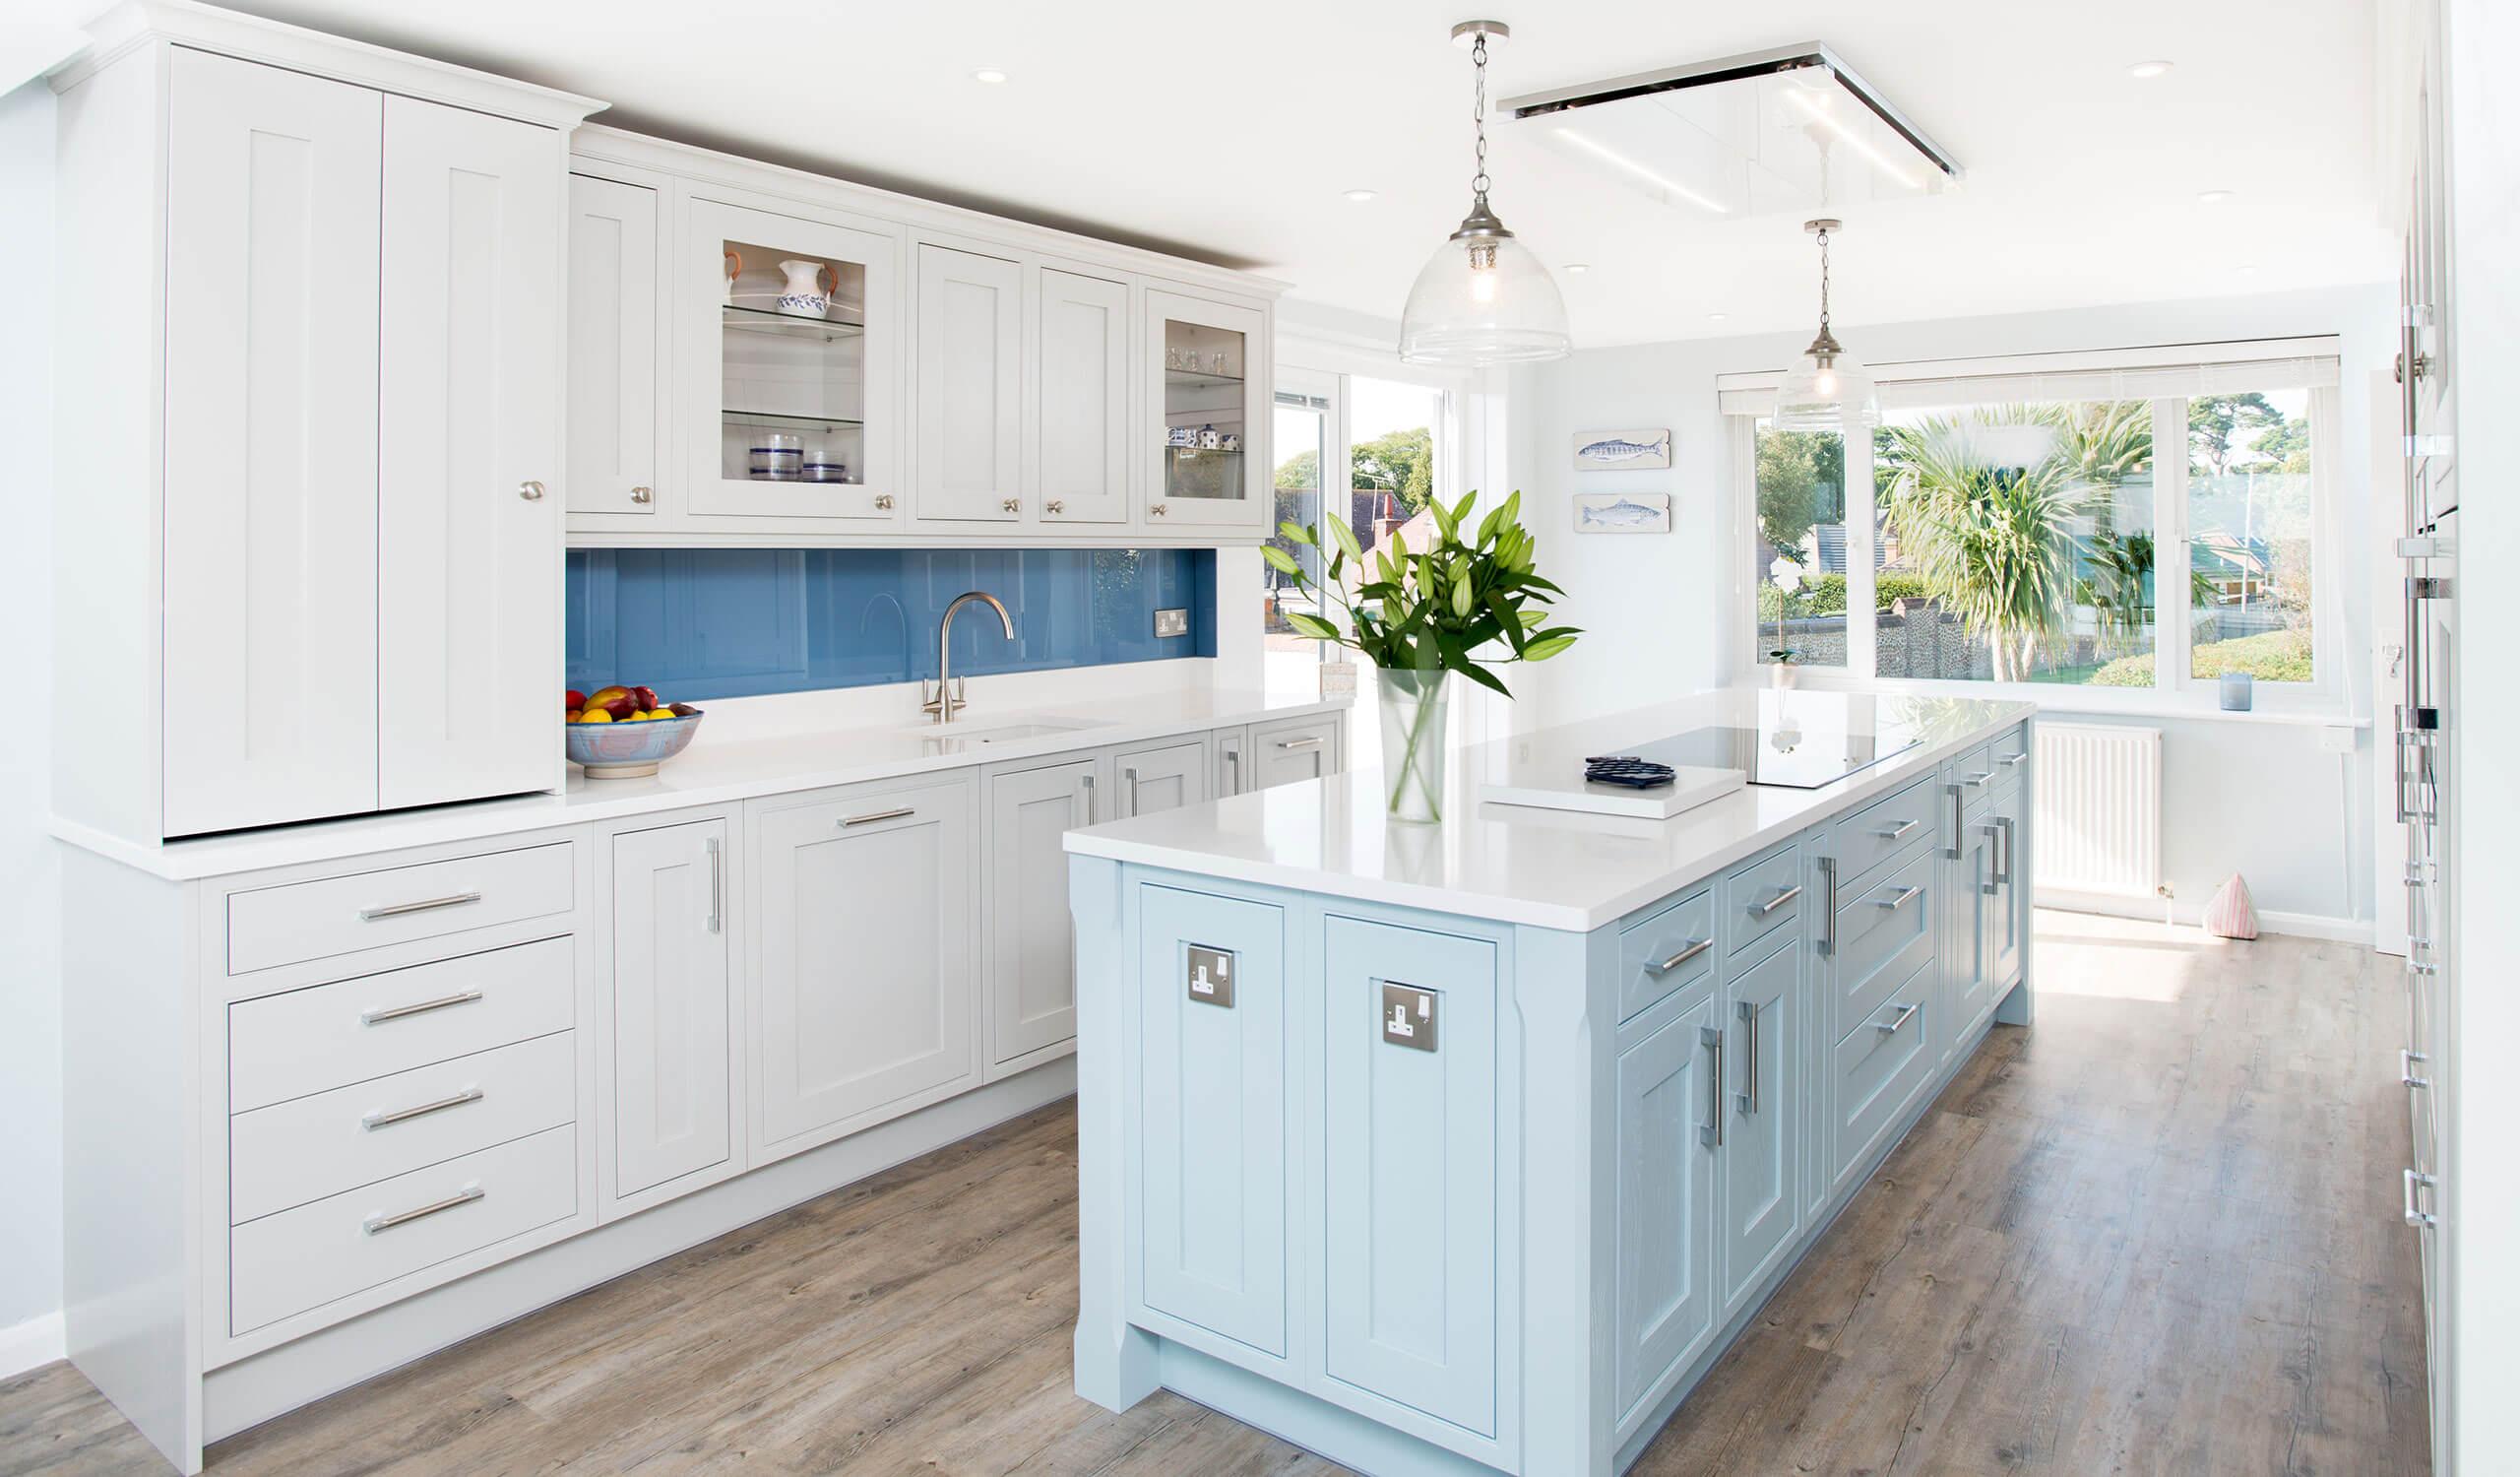 Bespoke modern kitchen island